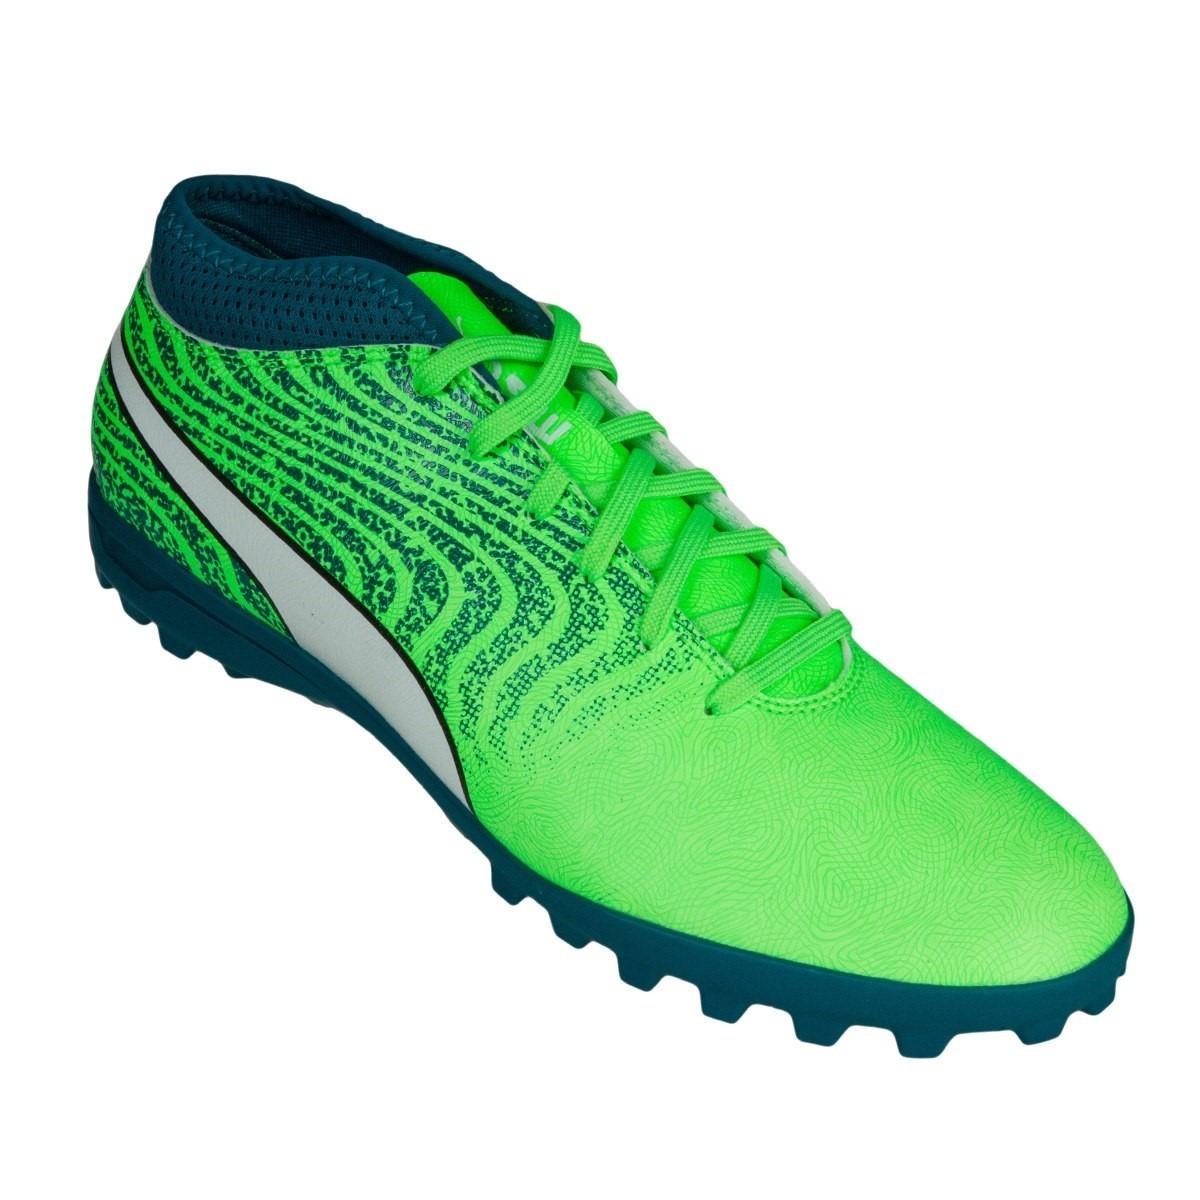 Tenis Futbol Rápido Puma One 18.4 Tt Deep Lagoon -   999.00 en ... 6ac9268a0a4ca